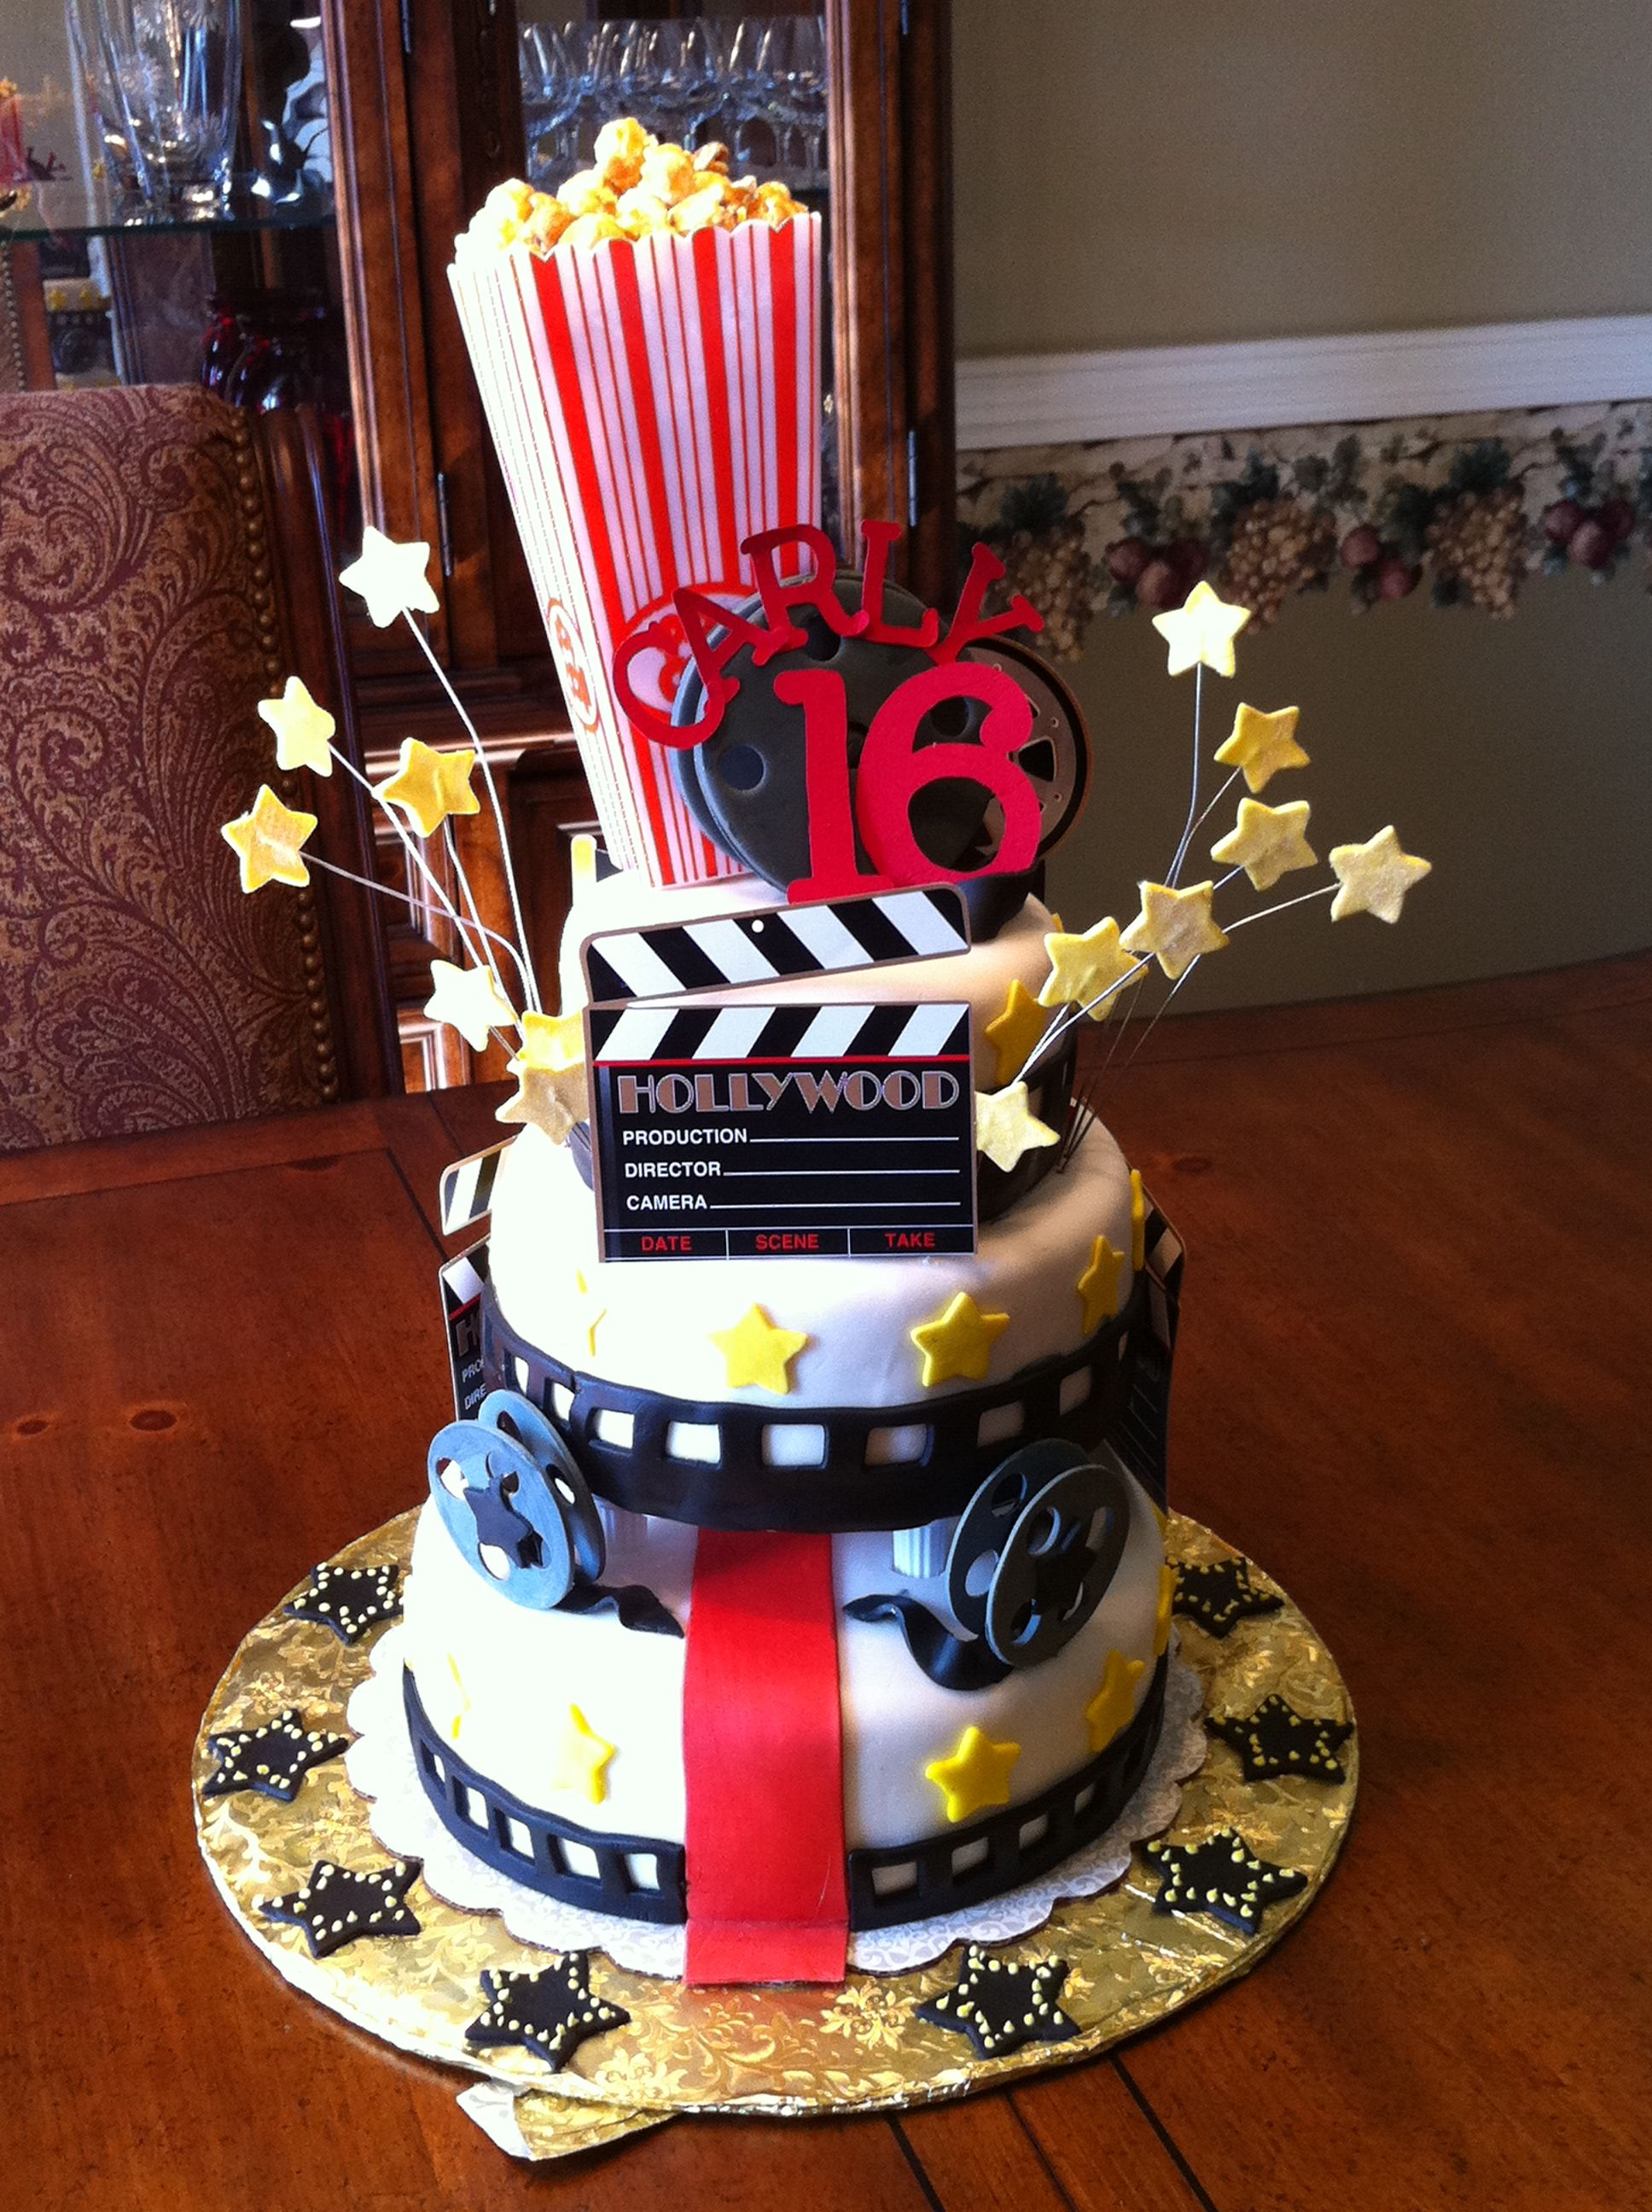 Cake 2014 Film Wikipedia